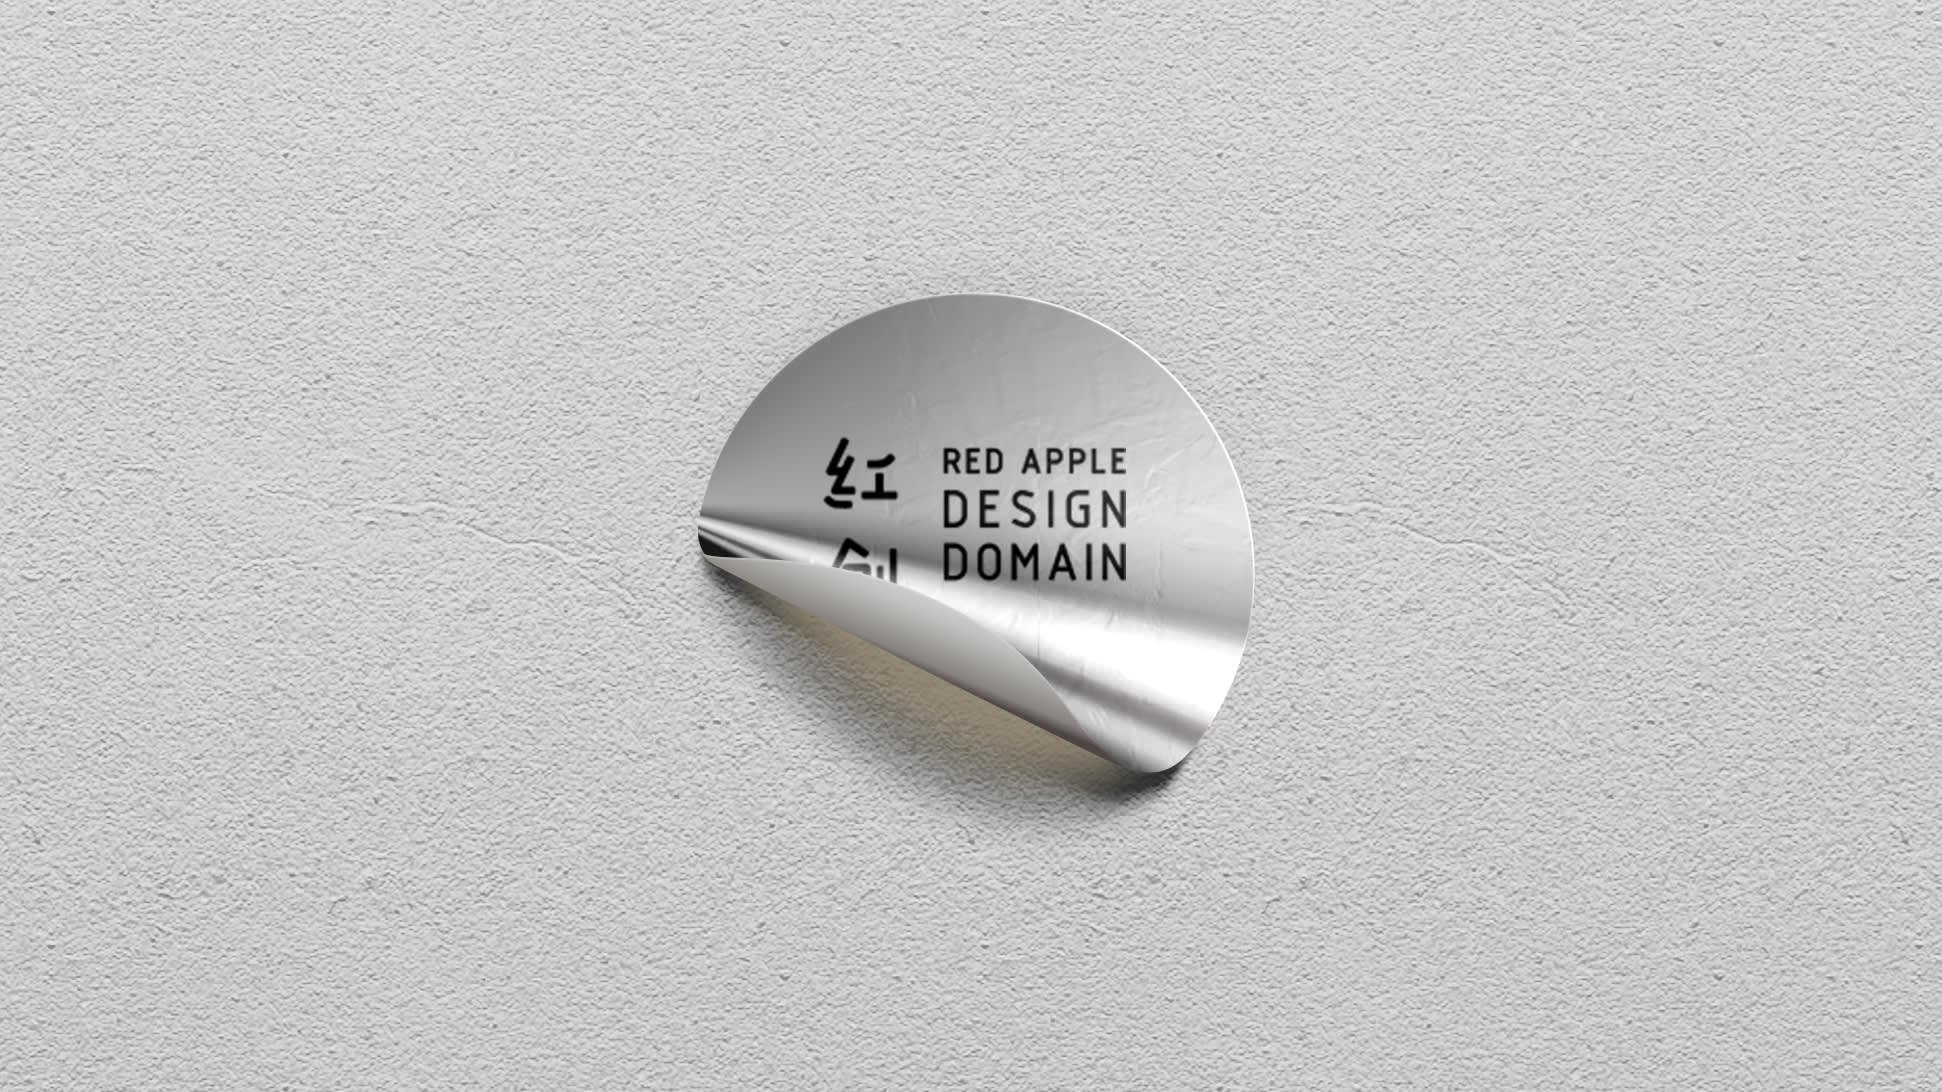 Red Apple Design Domain